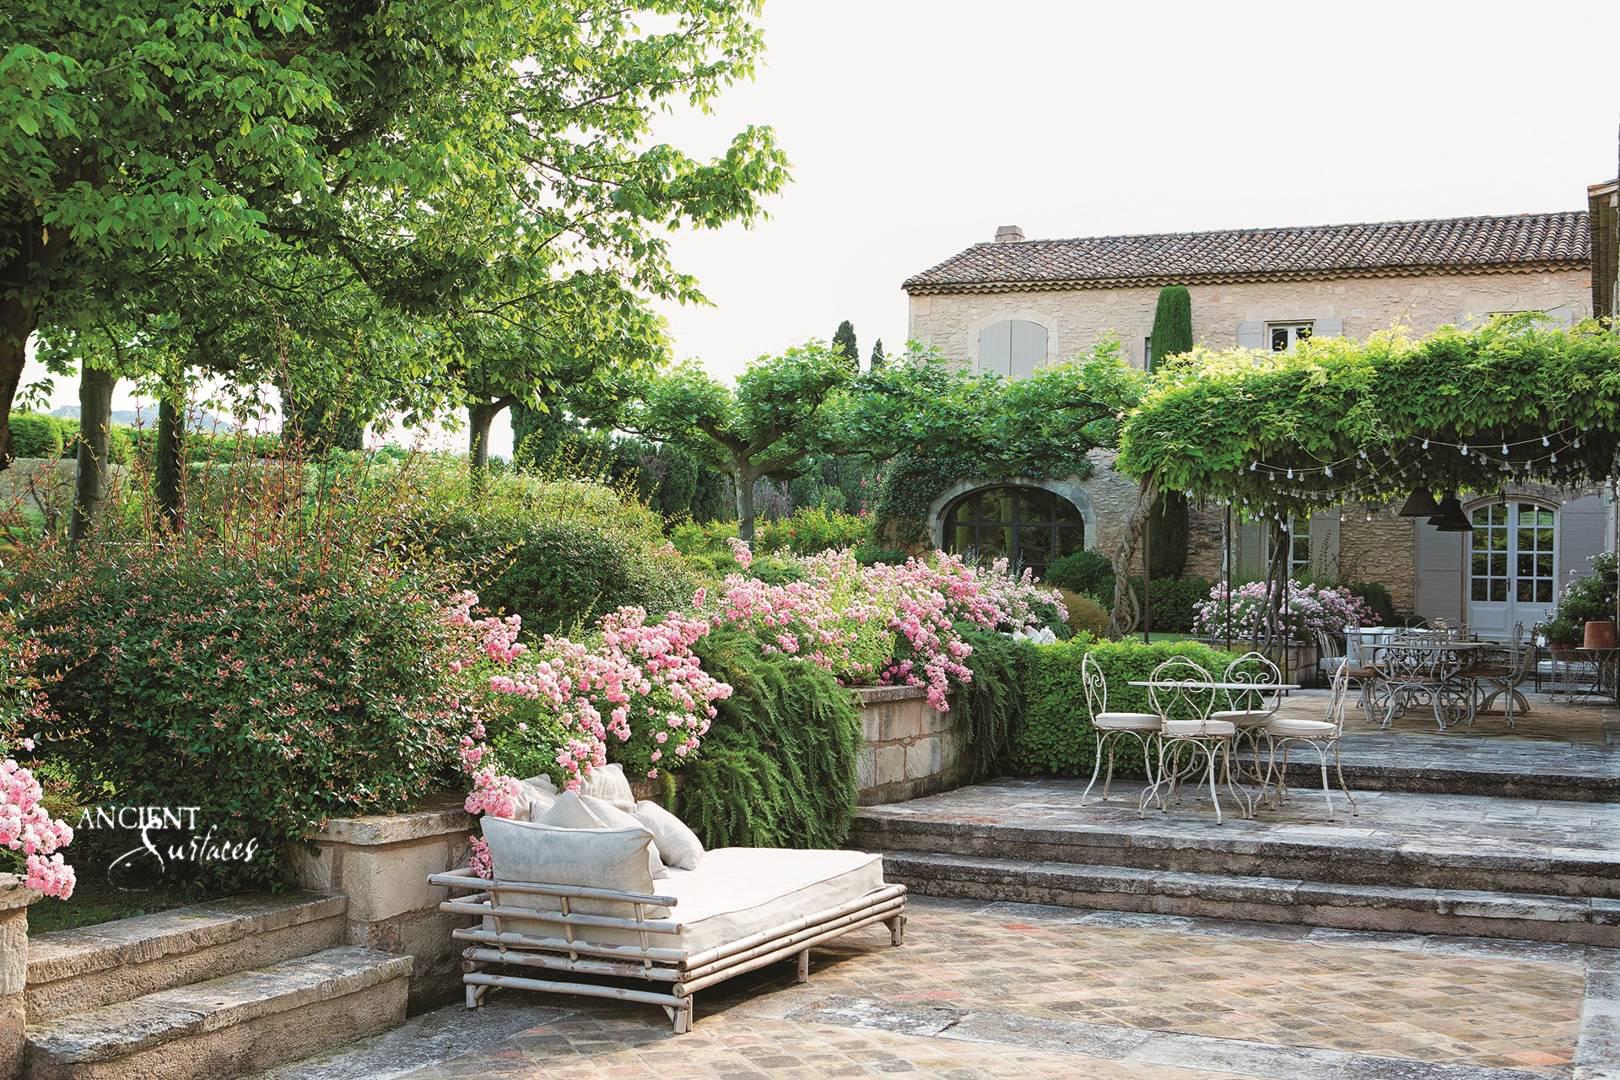 privence-farmhouse-outdoor-garden-beautiful-wall-cladding-limestone